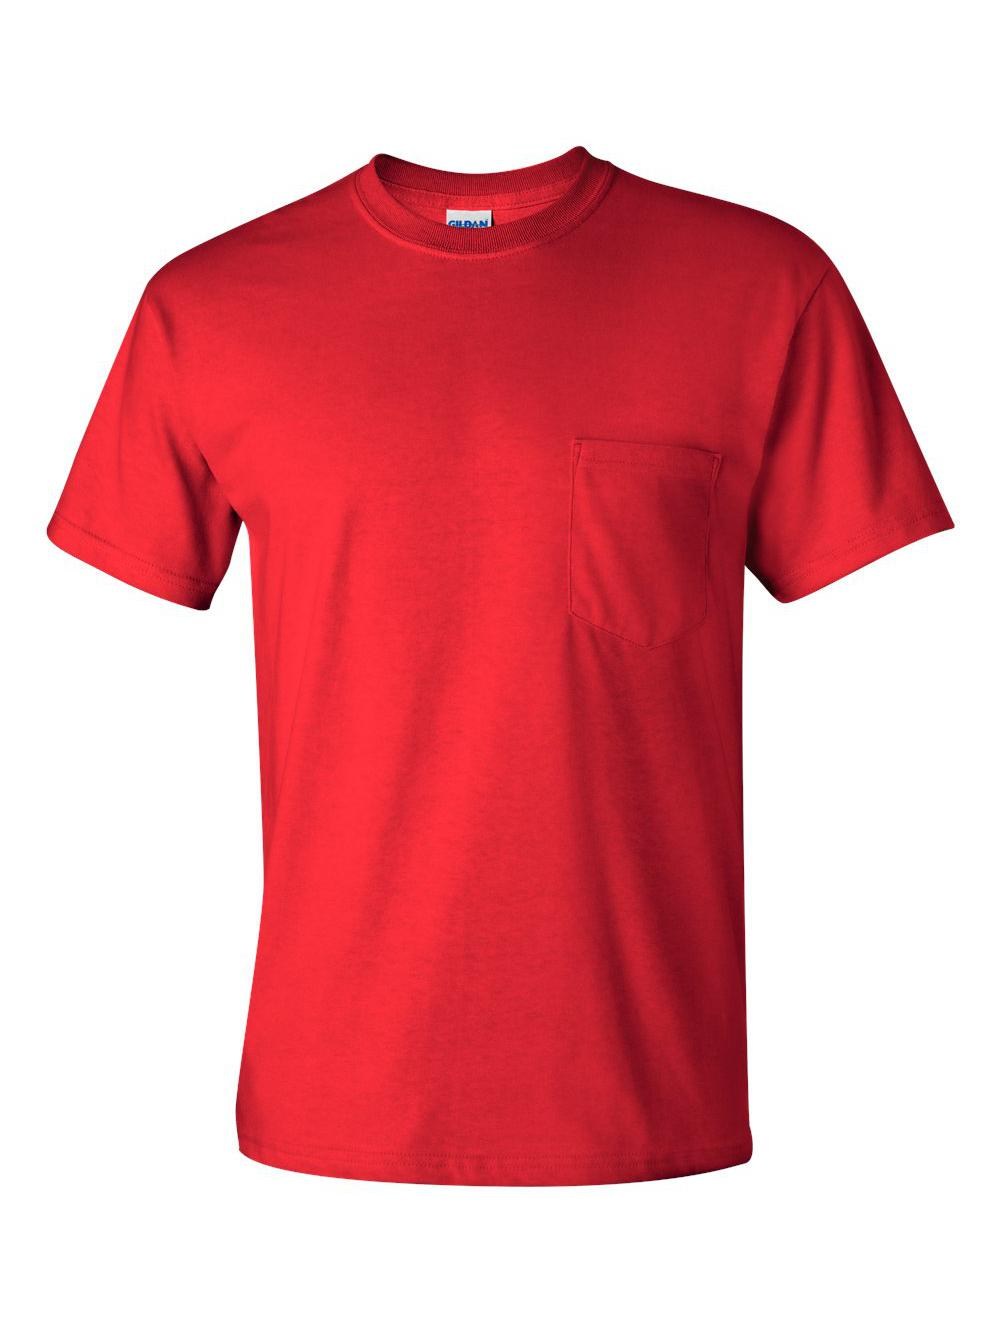 Gildan-Ultra-Cotton-T-Shirt-with-a-Pocket-2300 thumbnail 27